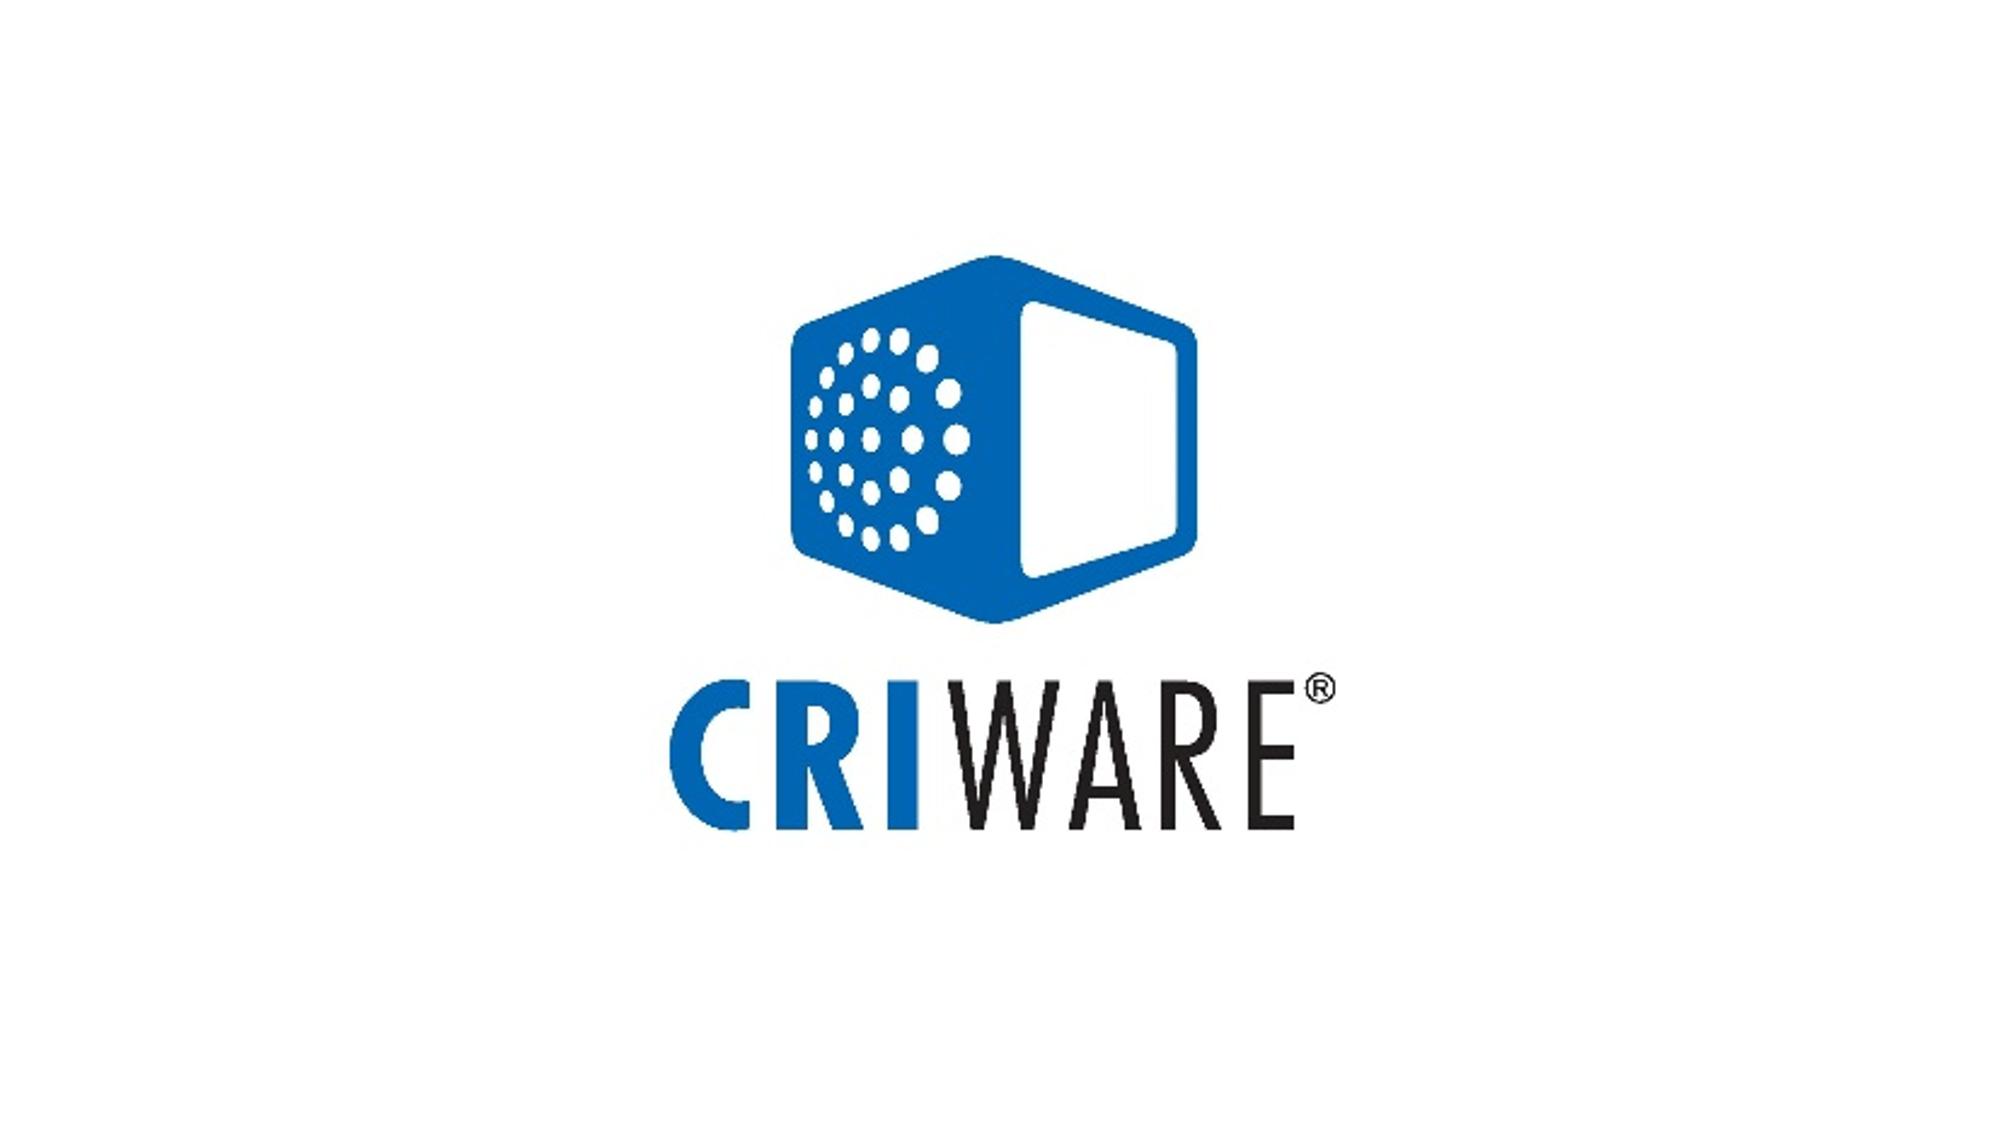 cri-mw.png